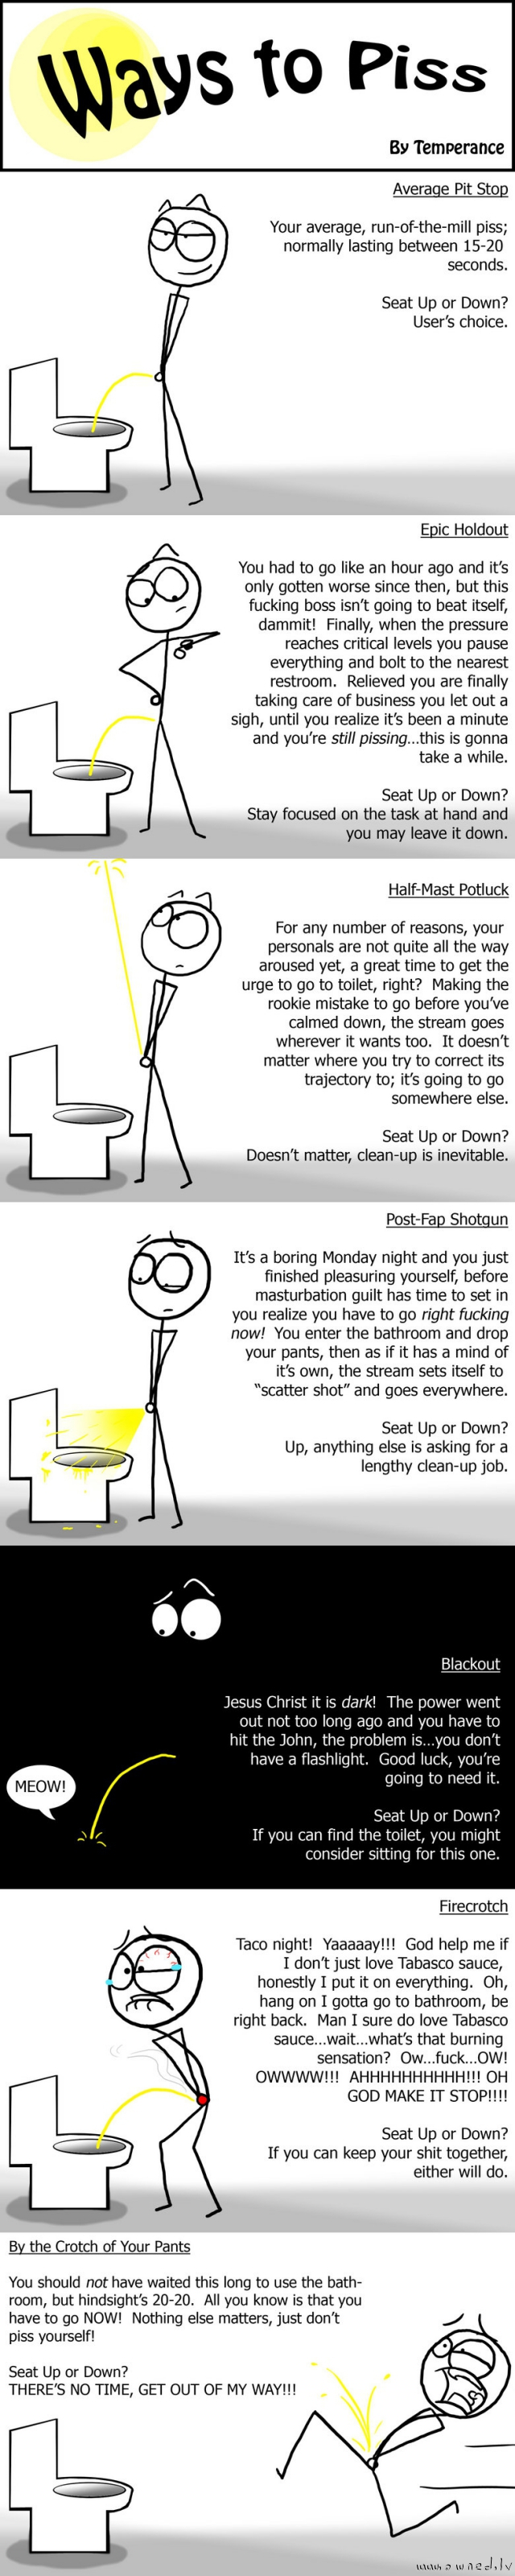 Ways to piss